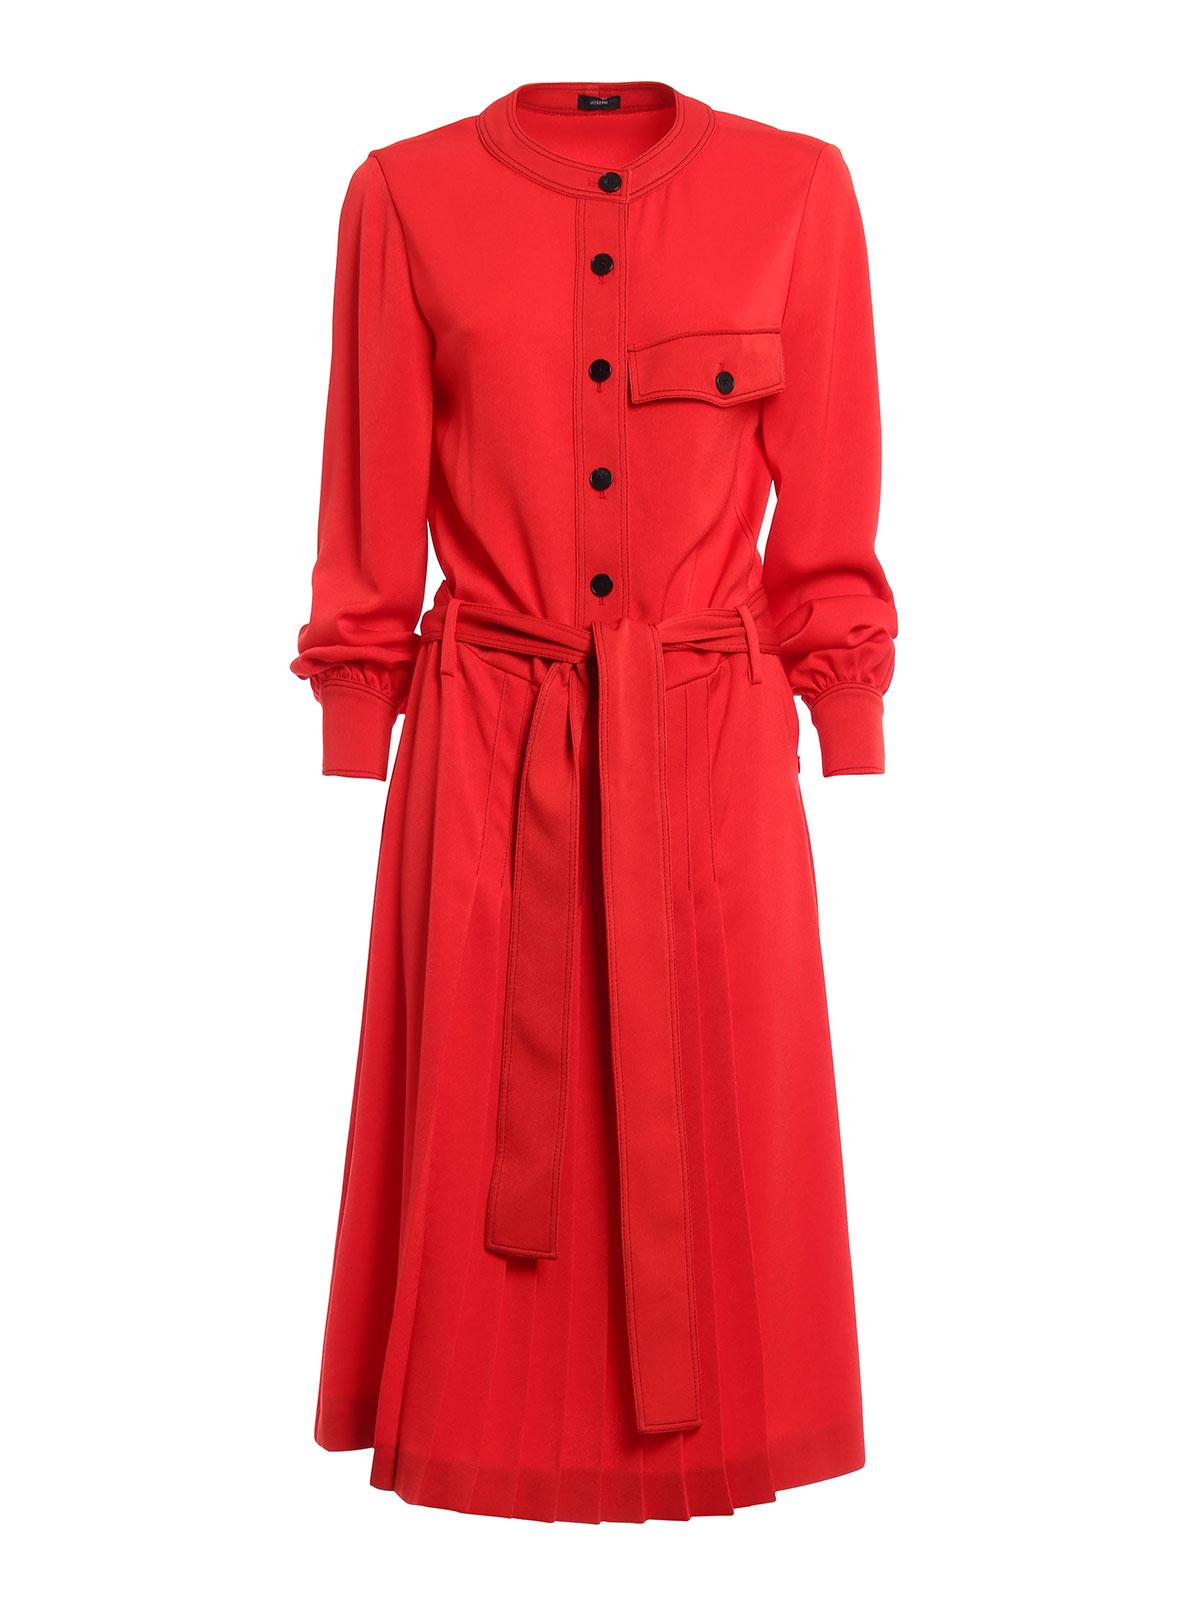 80668d25b807aa Joseph - Knielanges Kleid Ash - Rot - Knielange Kleider ...